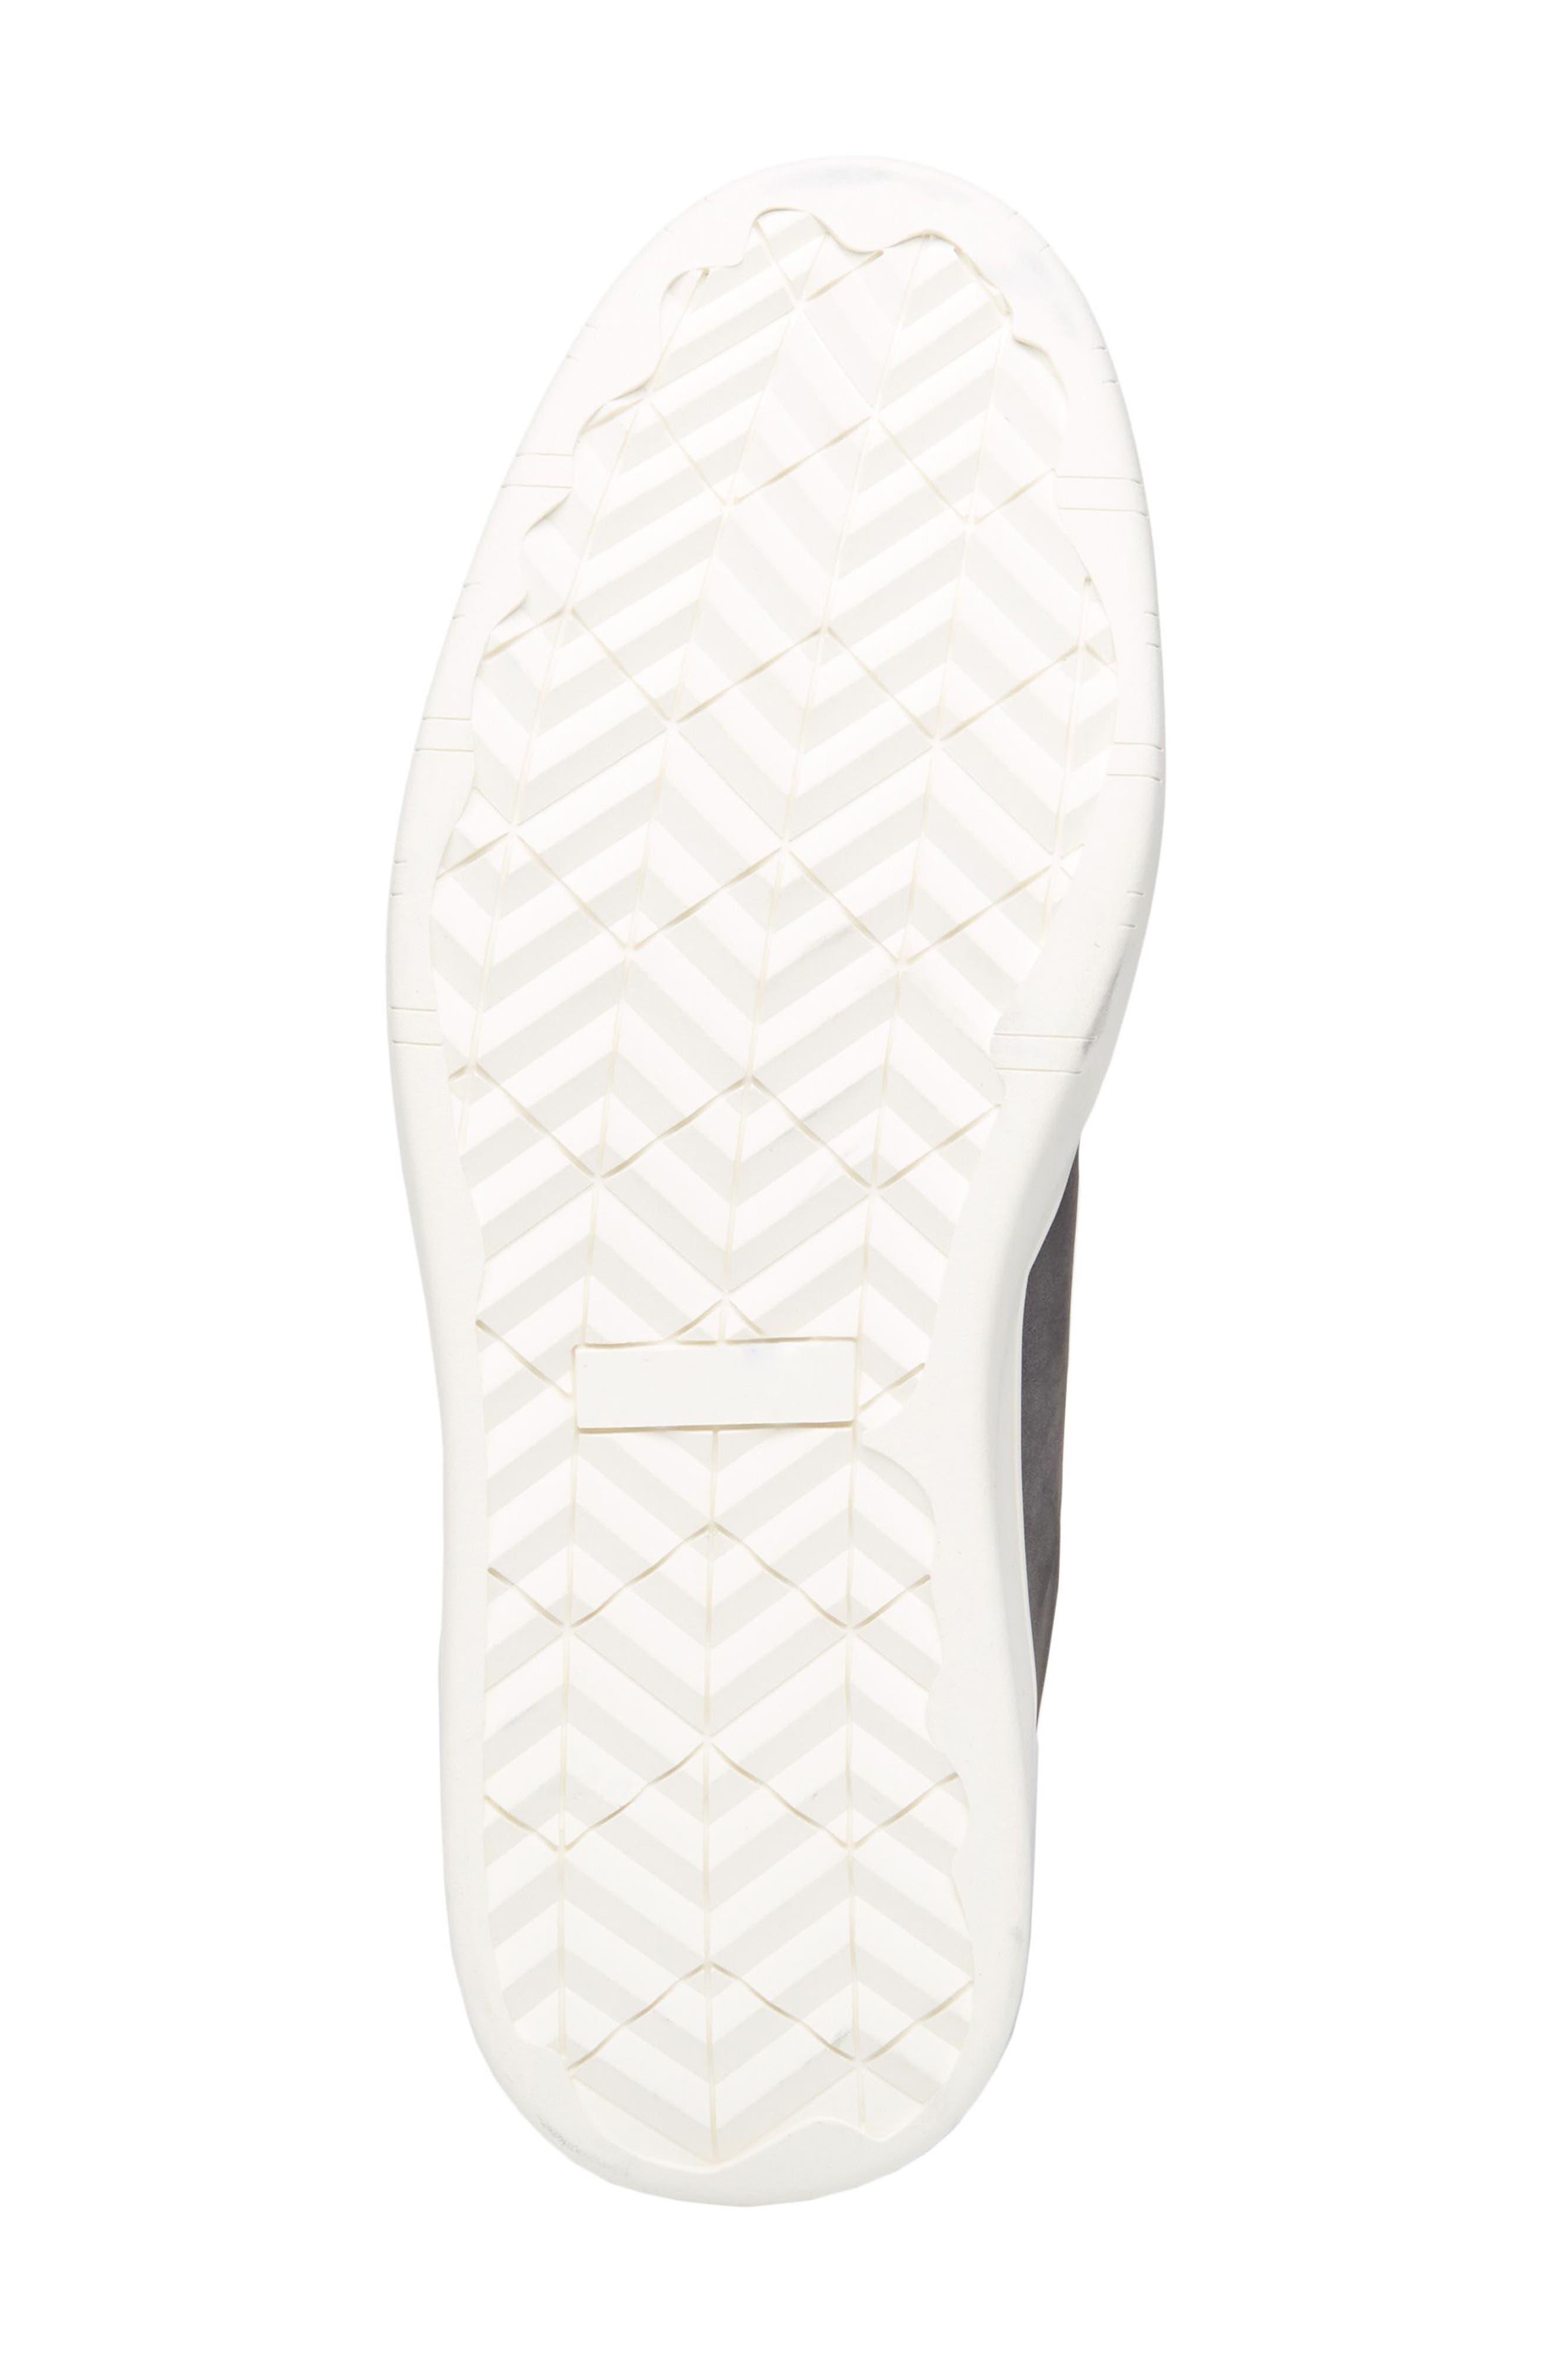 Vantage Sneaker,                             Alternate thumbnail 6, color,                             Grey